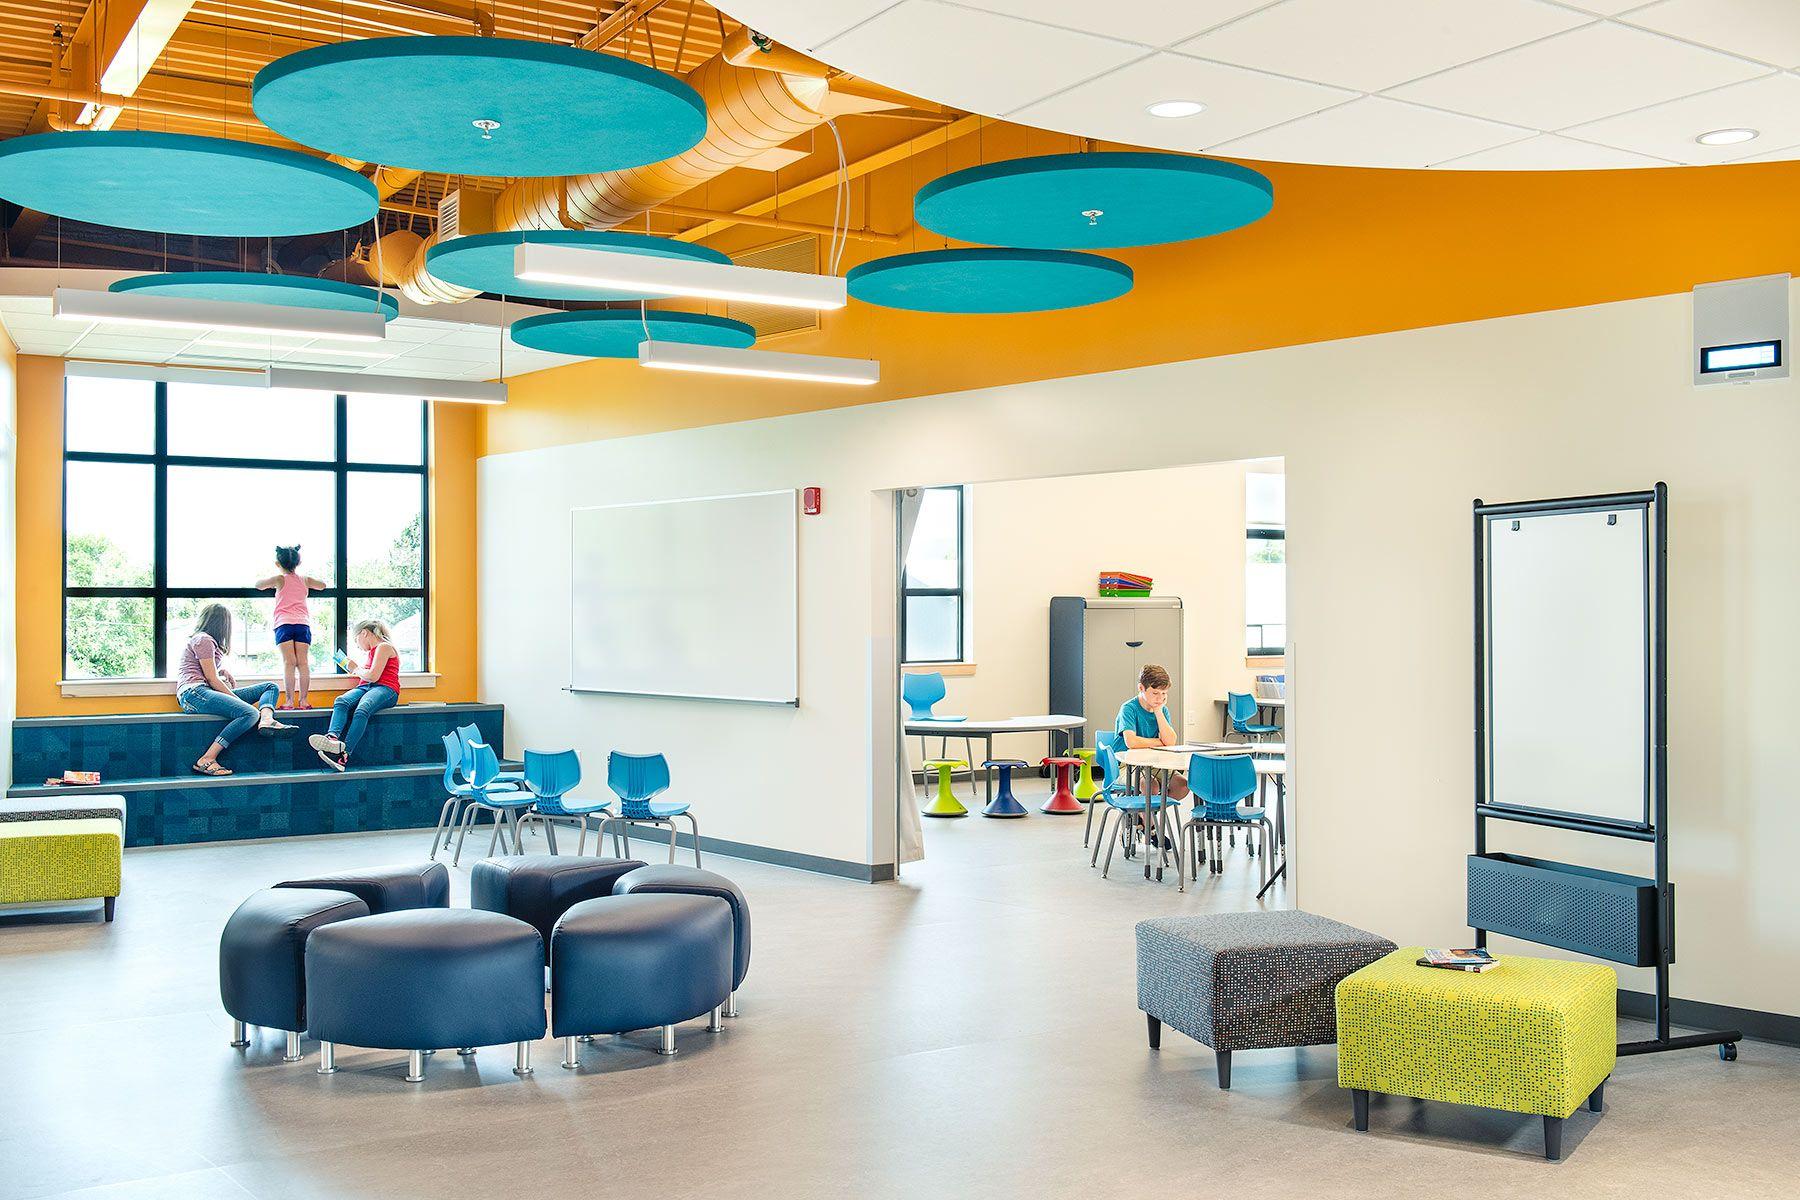 Bryant Elementary School, Helena, MT